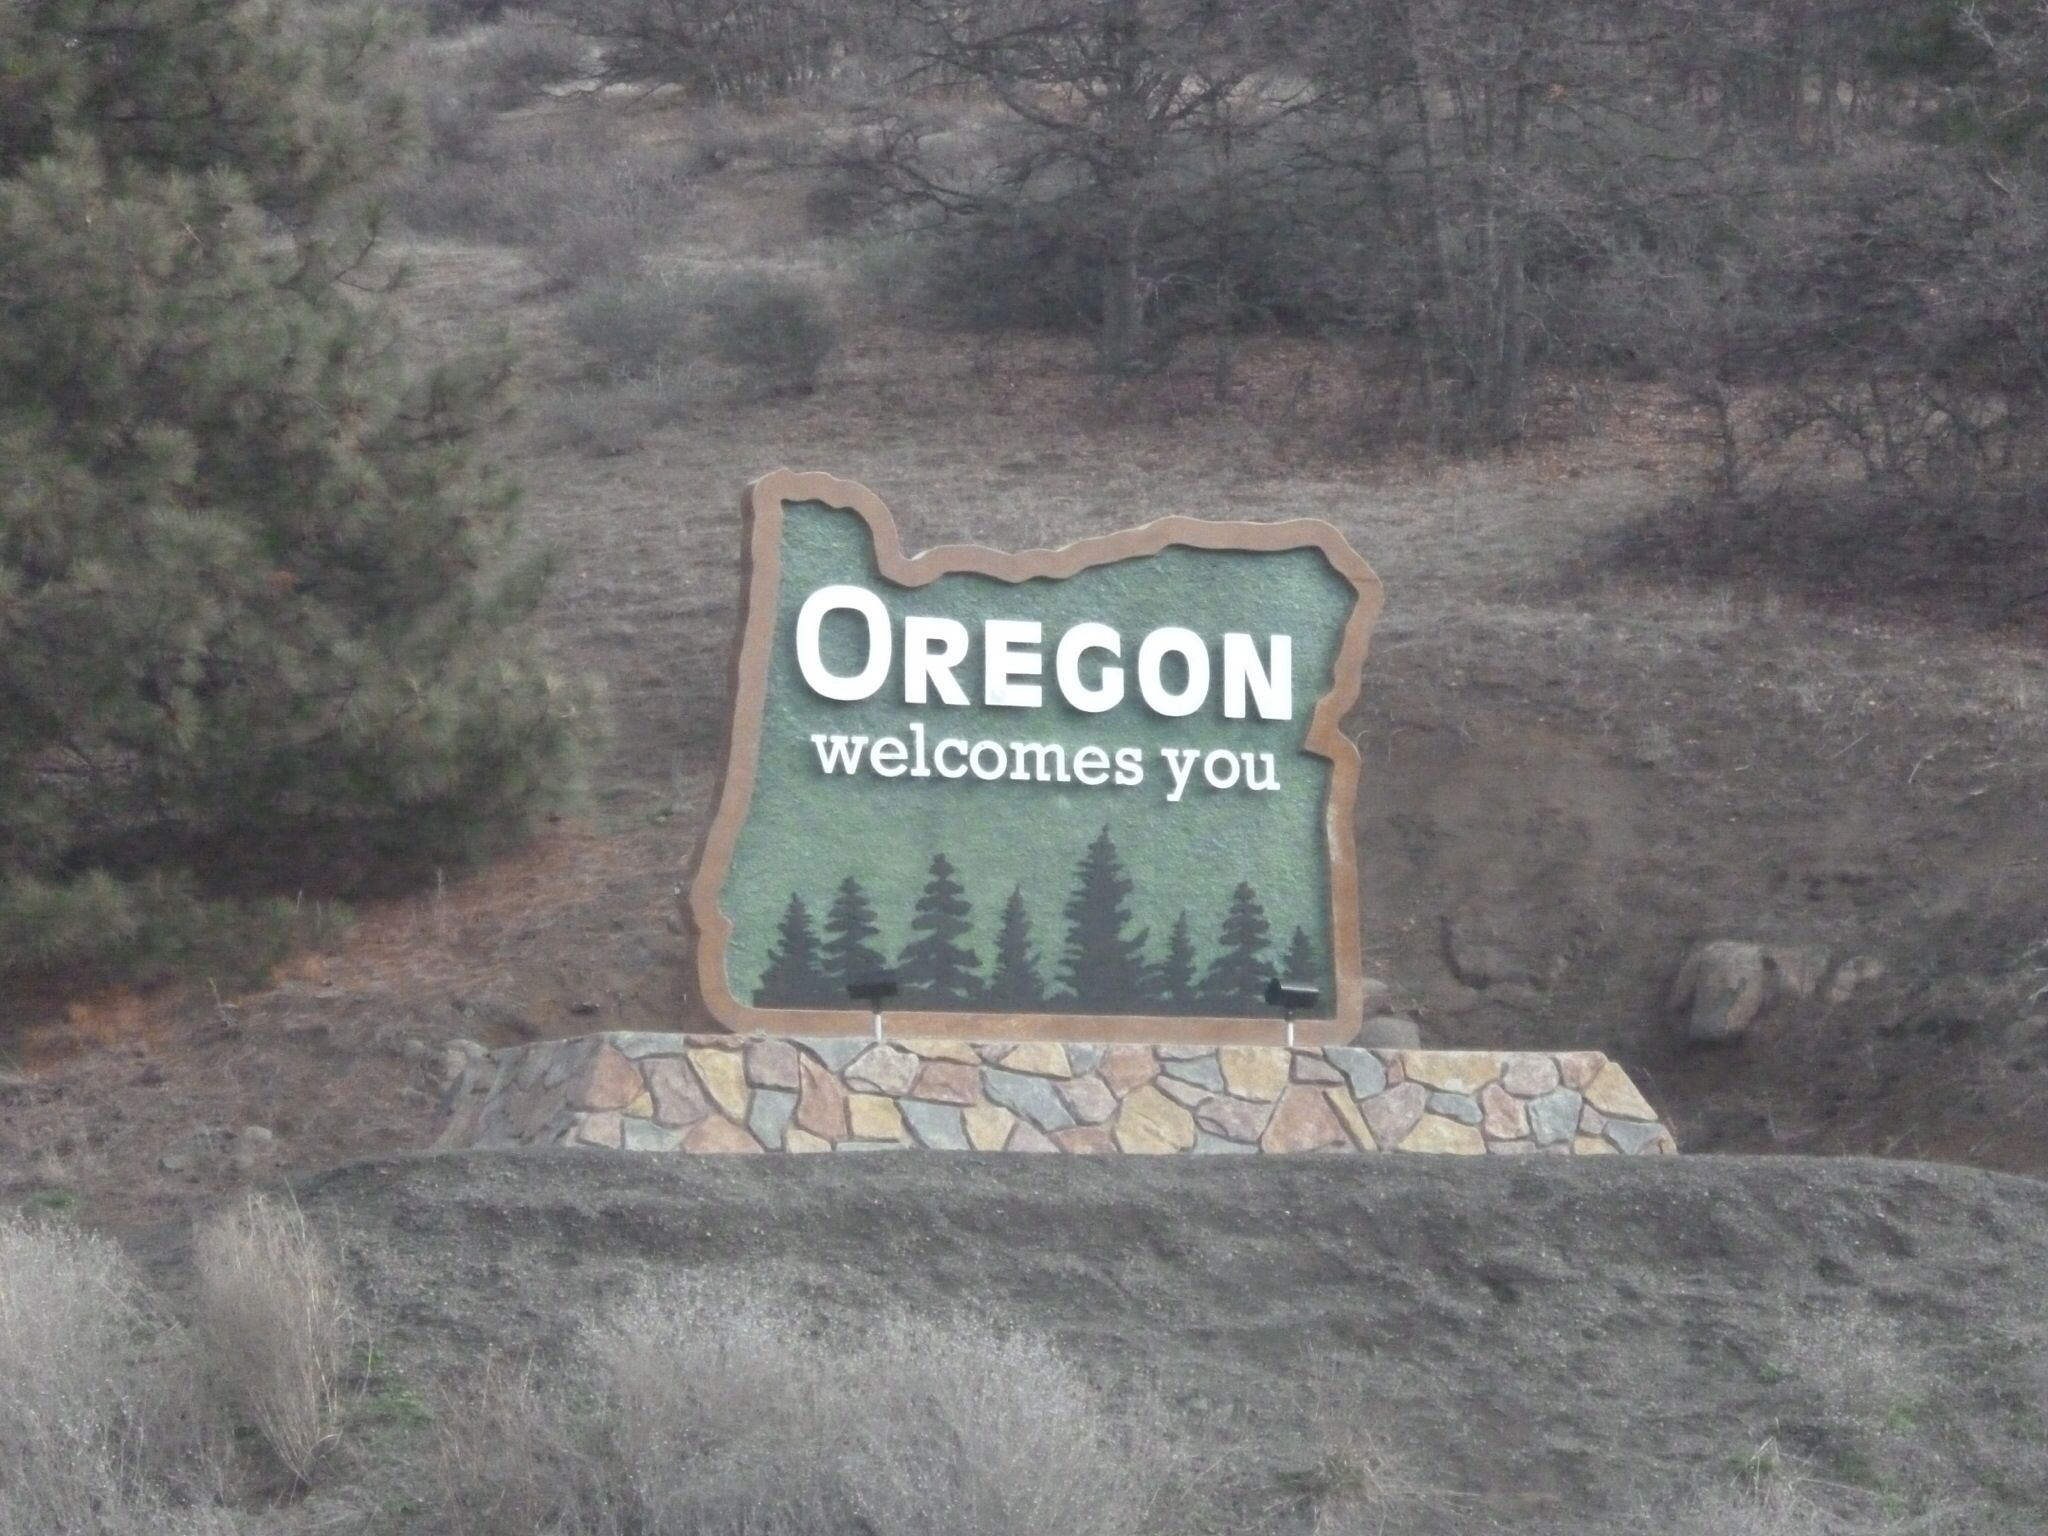 Welcome to Oregon sign.  I-5, California/Oregon state line, 2014.